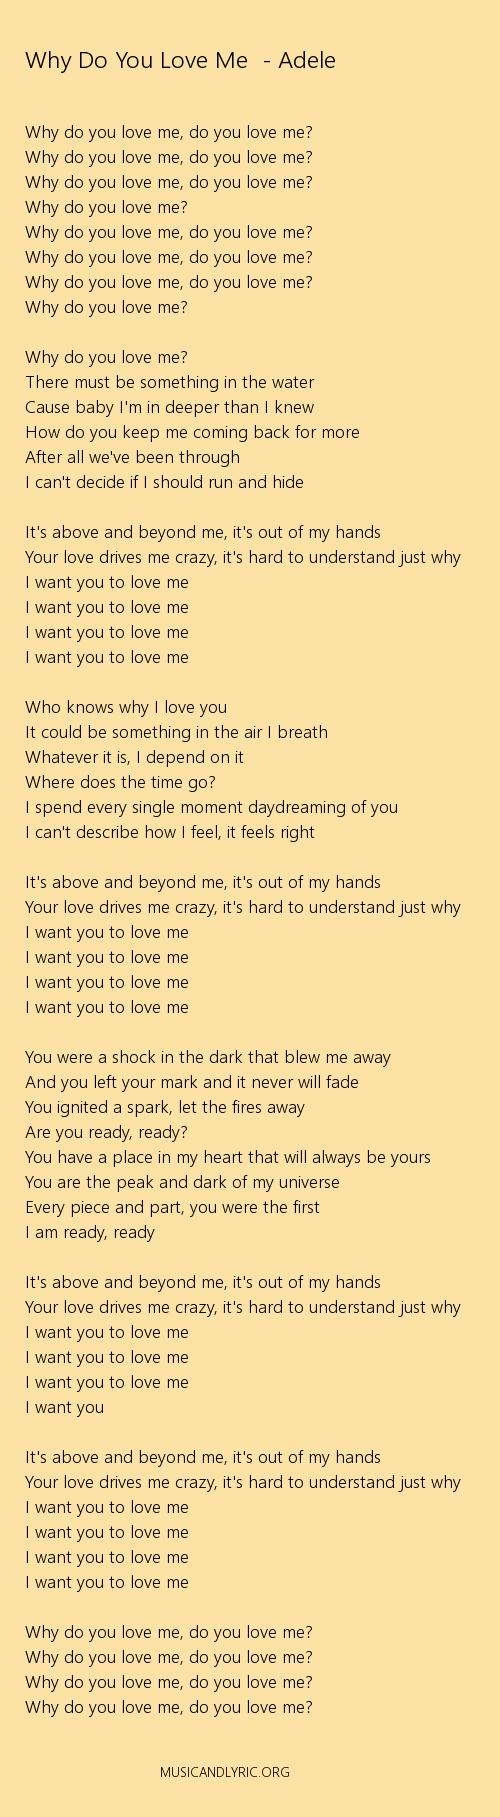 Music Lyrics Pdf